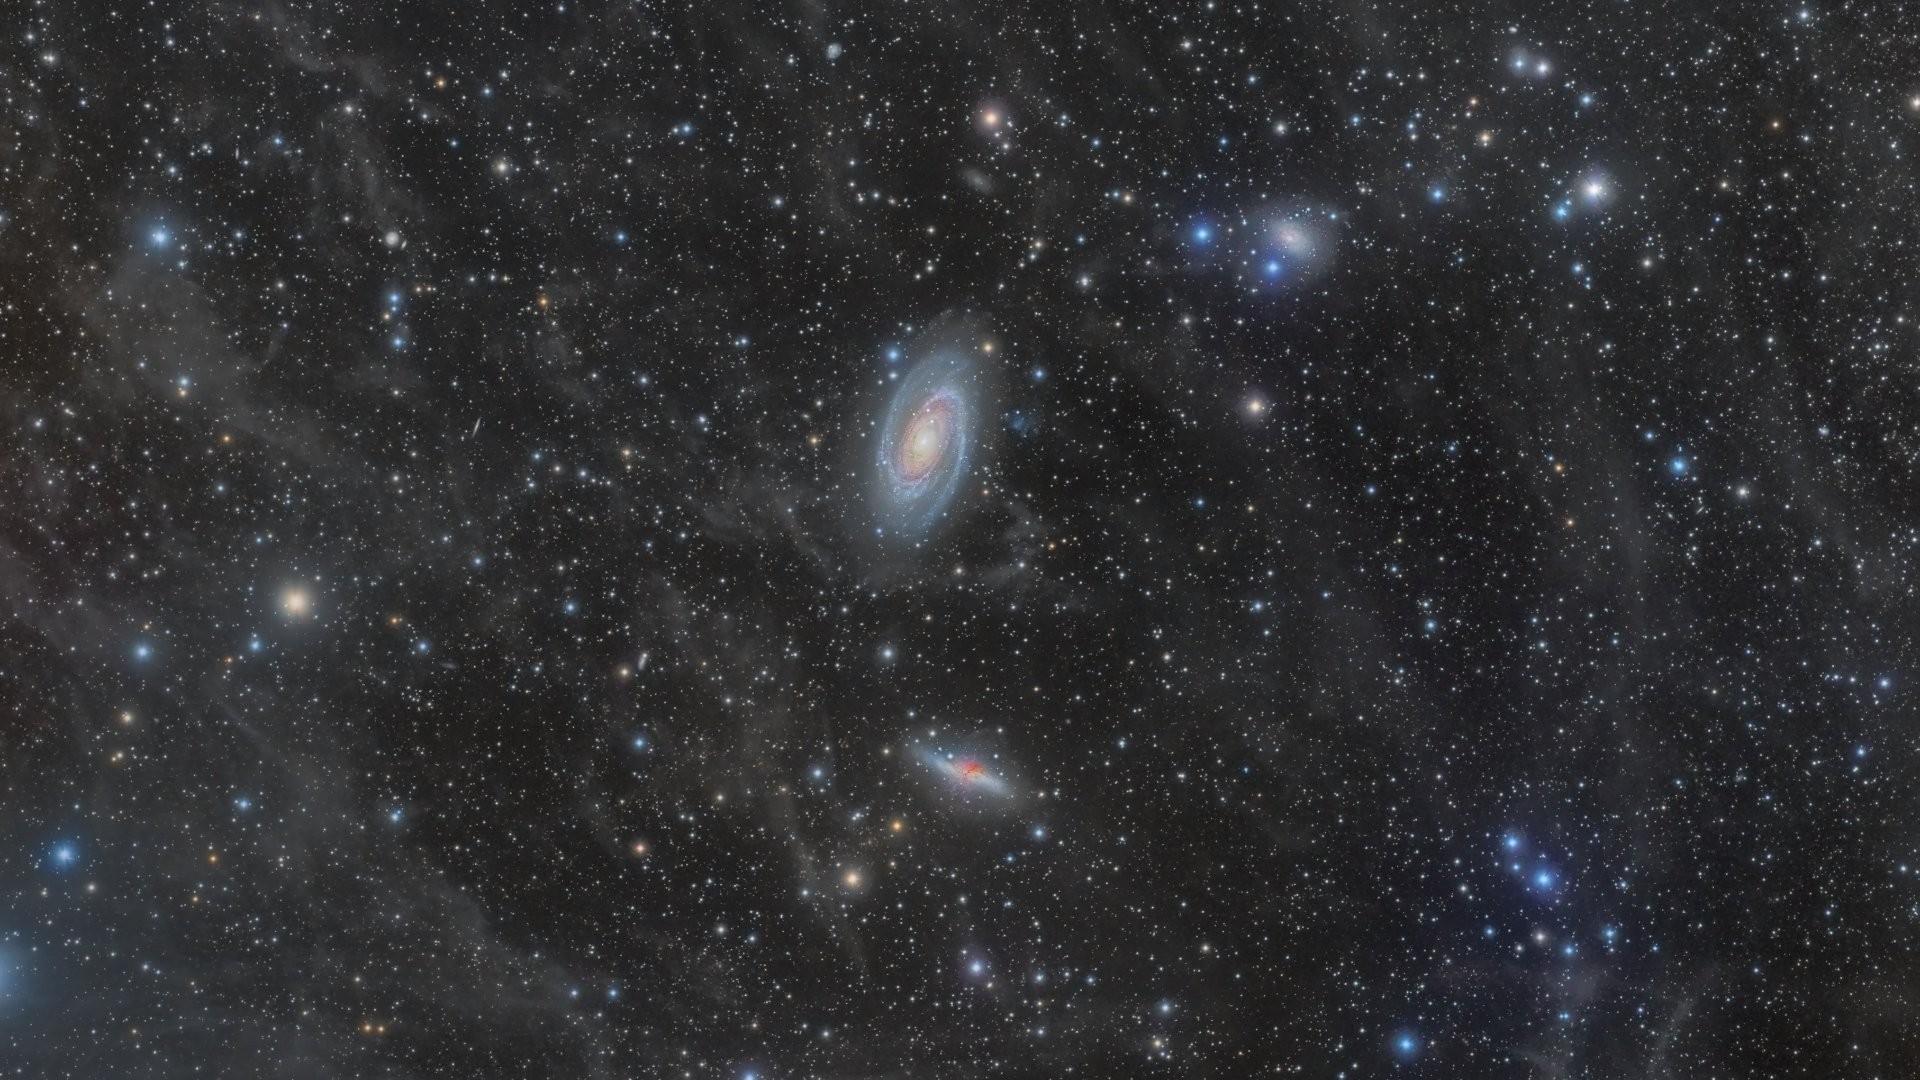 Hubble Tag – Nasa Galaxies Stars Hubble Amazing Nature Desktop Wallpaper  for HD 16:9